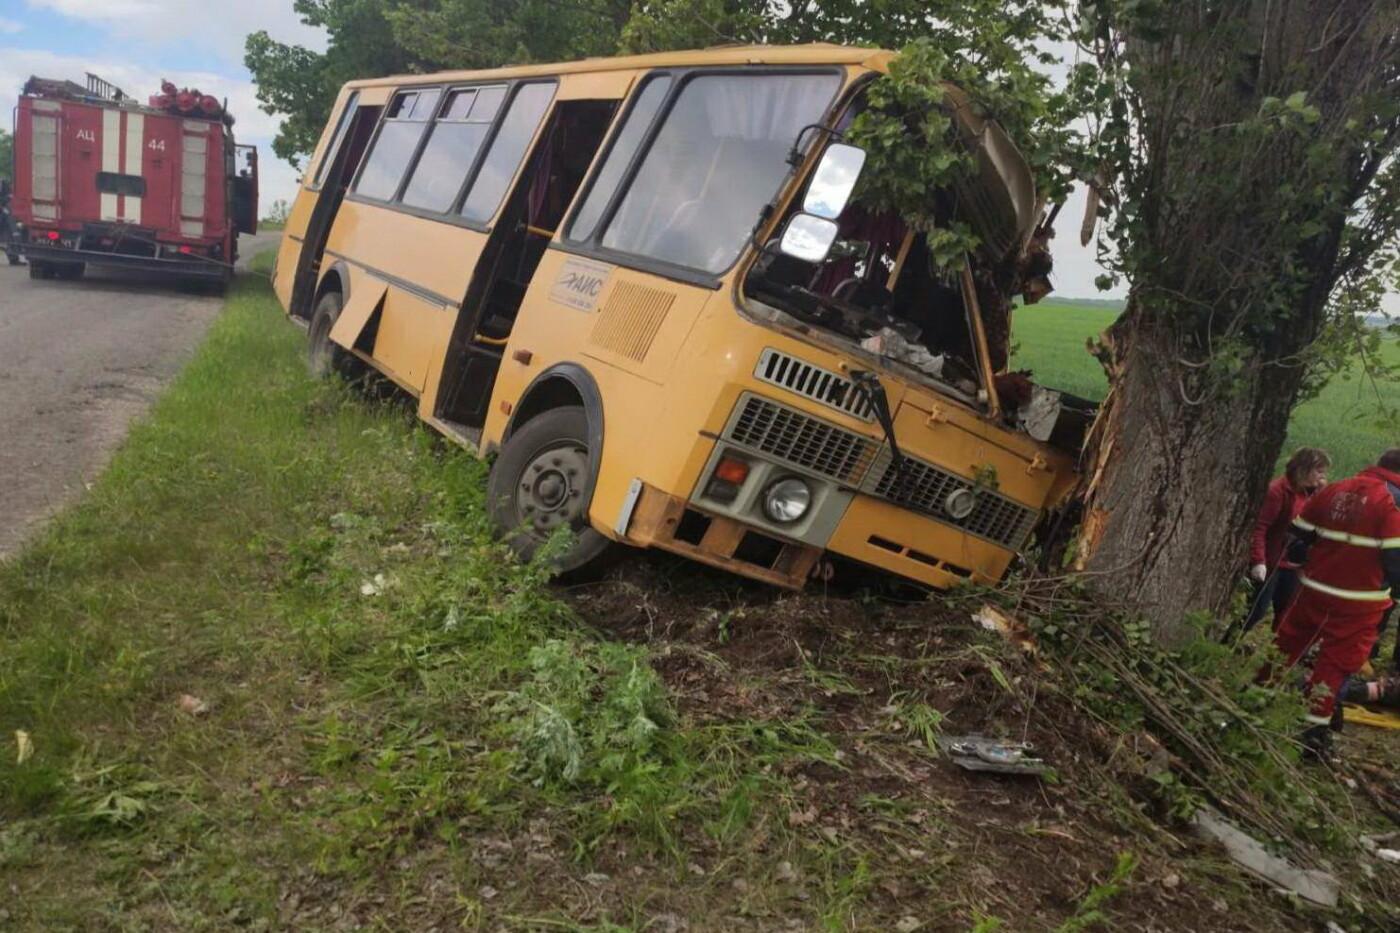 На Харьковщине рейсовый автобус съехал в кювет и «влетел» в дерево: водителя доставали спасатели, - ФОТО, фото-1